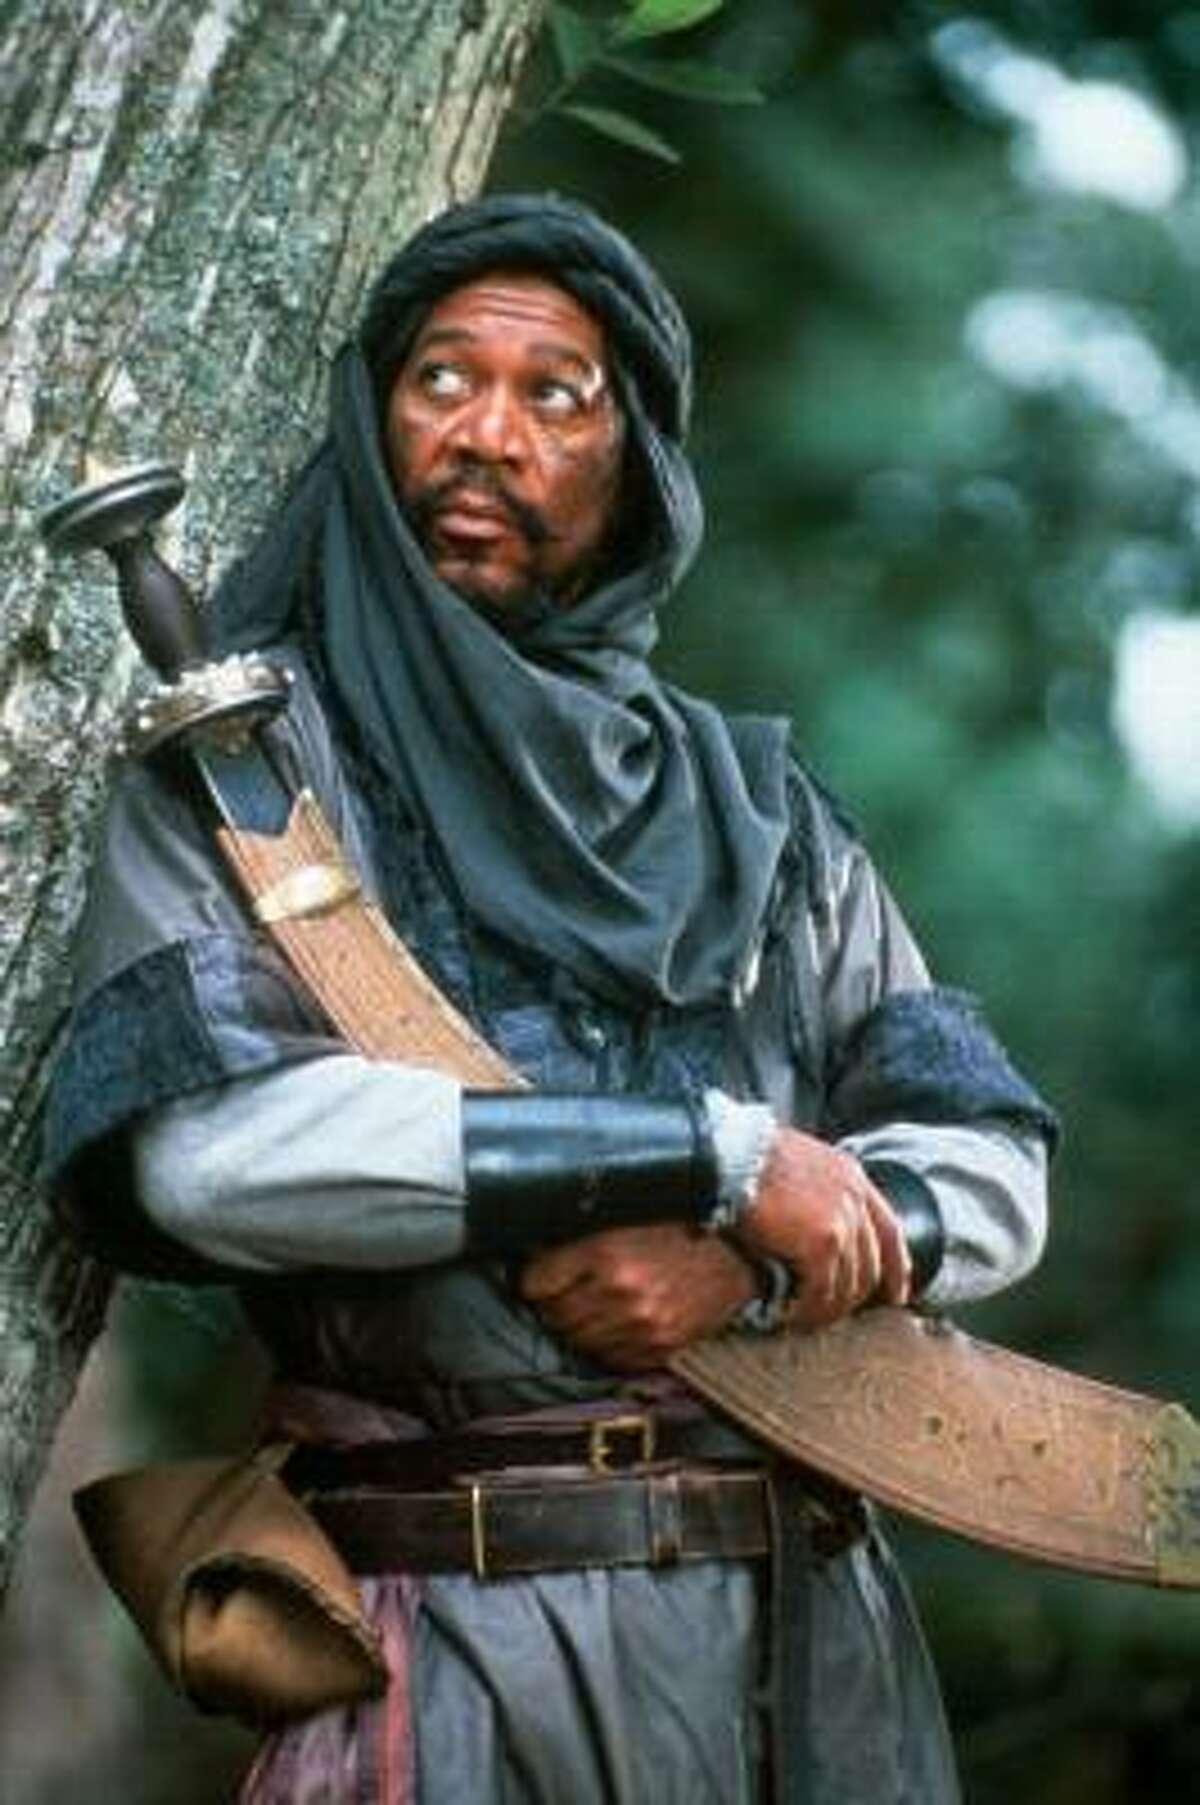 Morgan Freeman as Azeem in Robin Hood: Prince of Thieves. (1991)